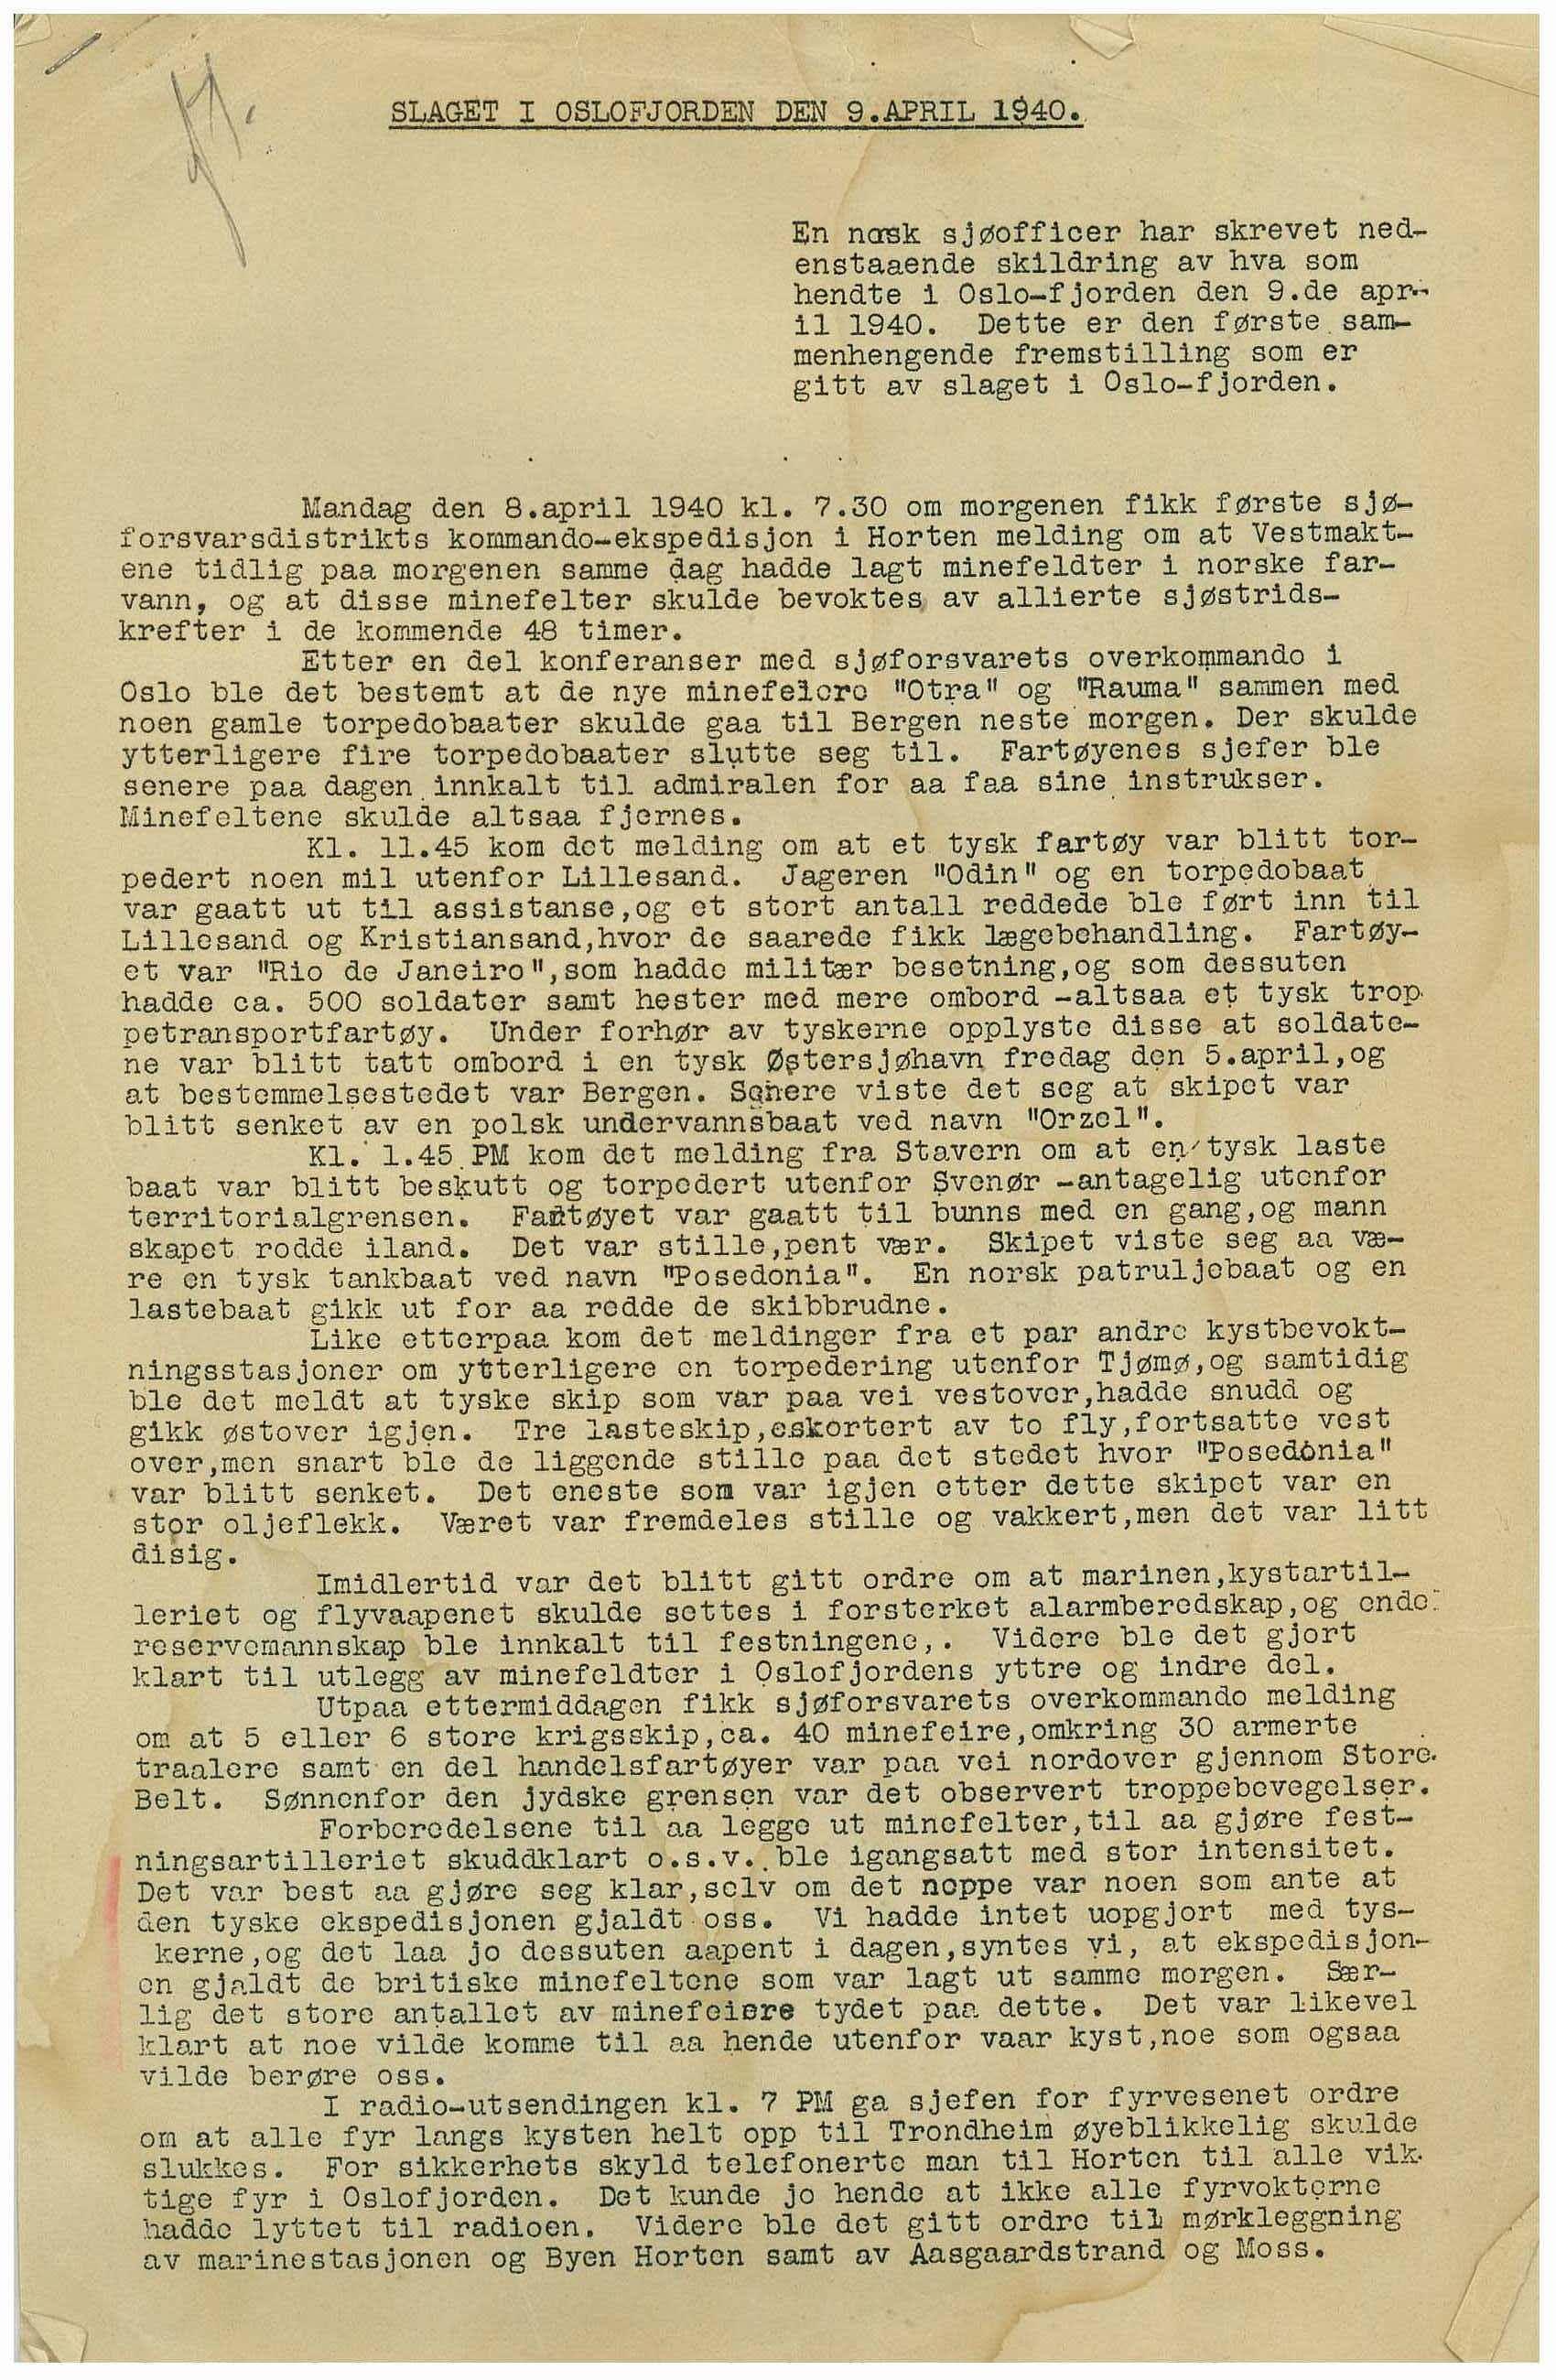 RA, Ljungberg, Birger, D/L0002: Korrespondanse, saksarkiv, 1940, s. 1